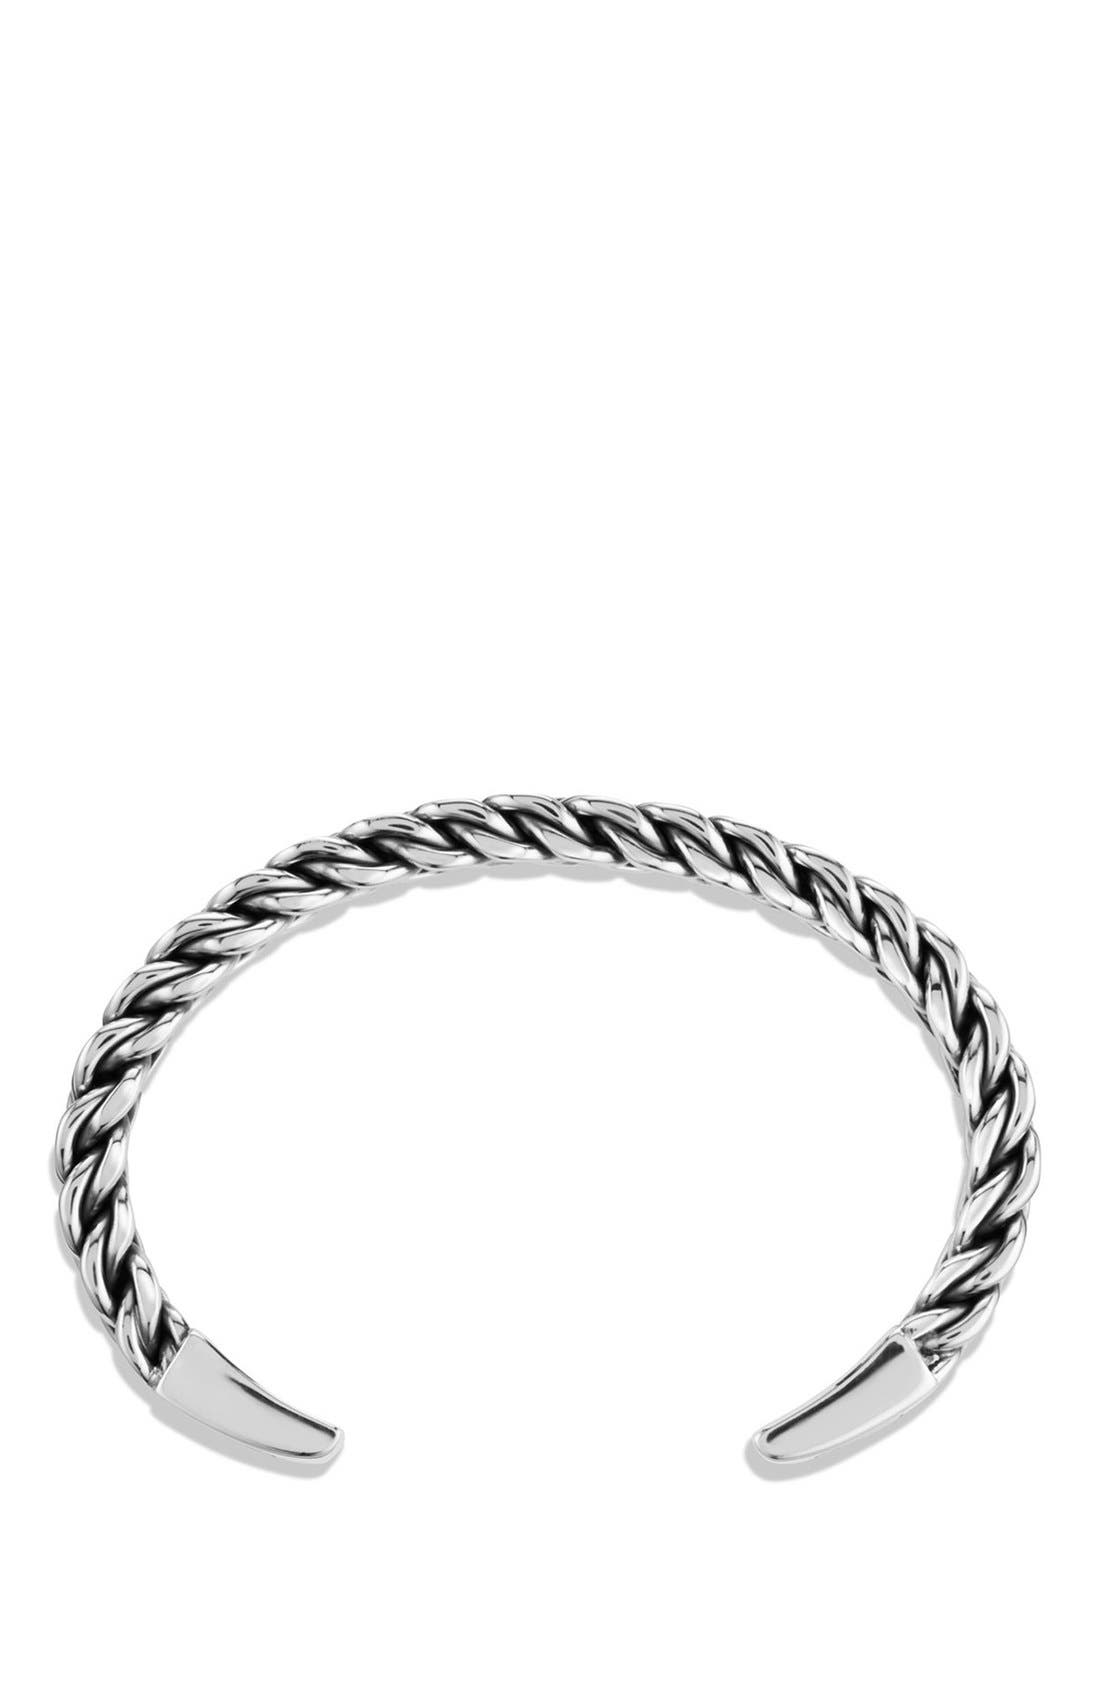 'Chain' Woven Cuff Bracelet,                             Alternate thumbnail 2, color,                             040